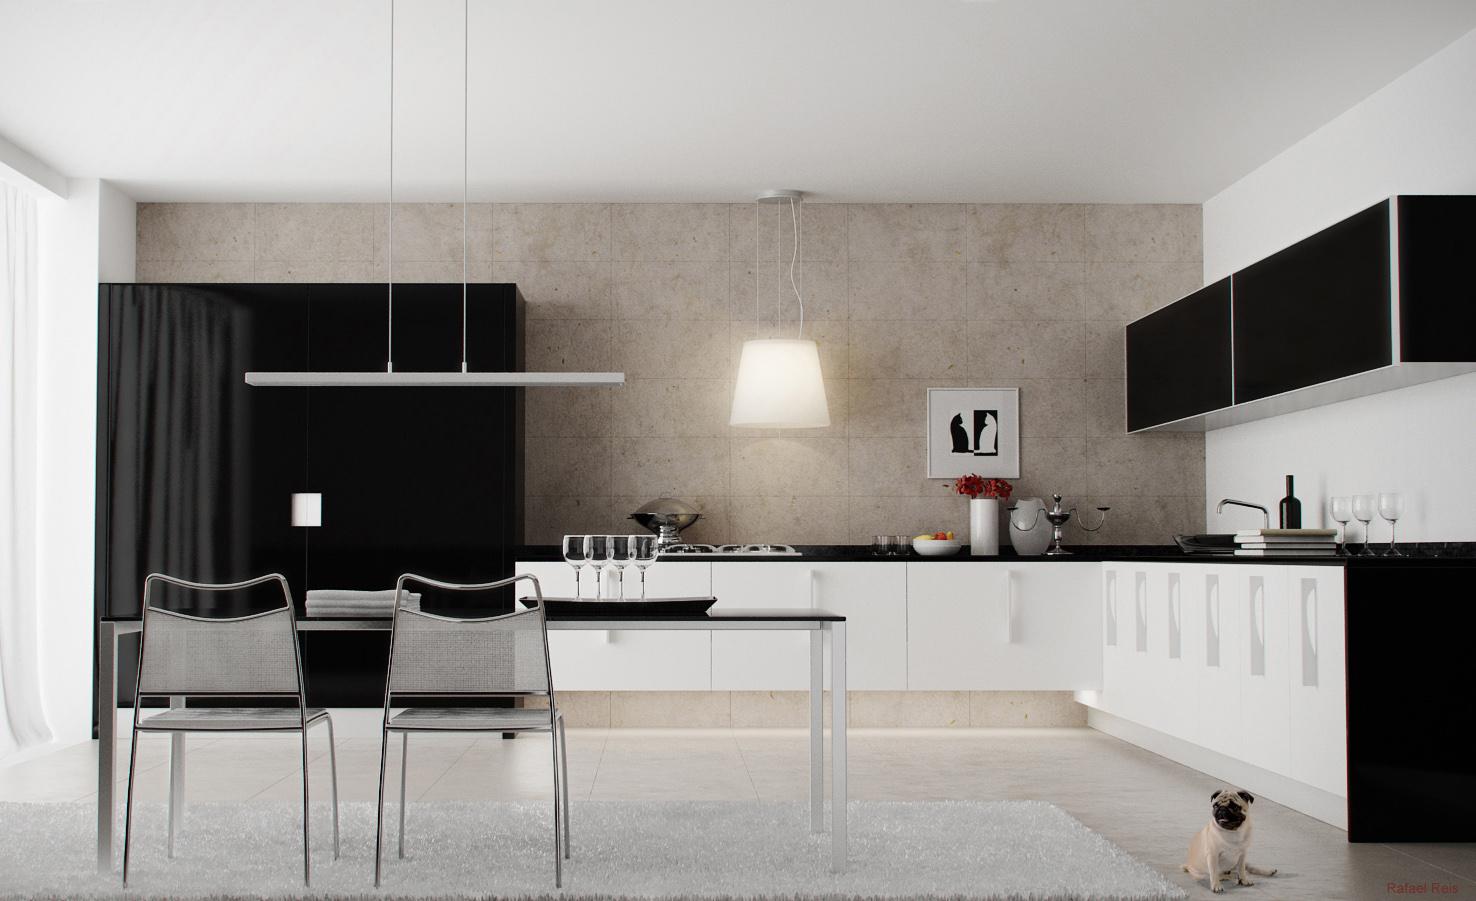 Monochrome Modern Kitchen photo - 3